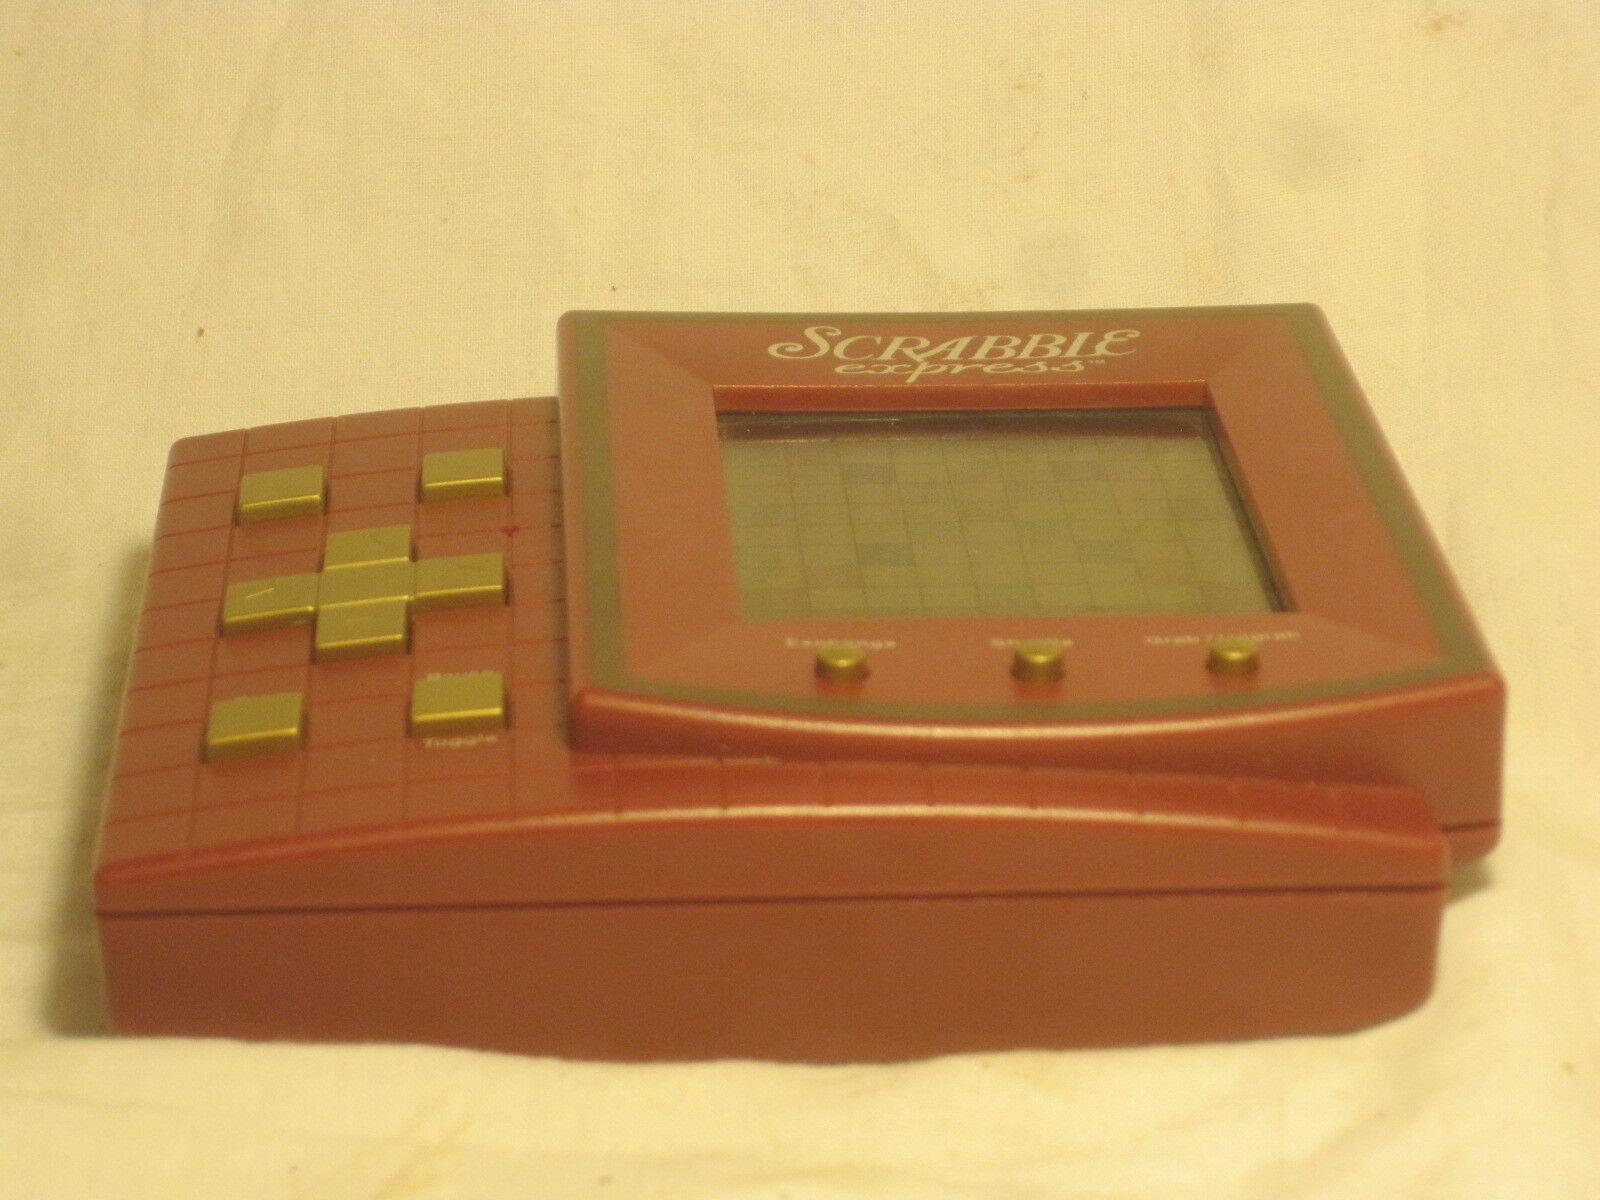 Scrabble Scrabble Scrabble Express Hasbro electronic LCD hand held video game 94ec65